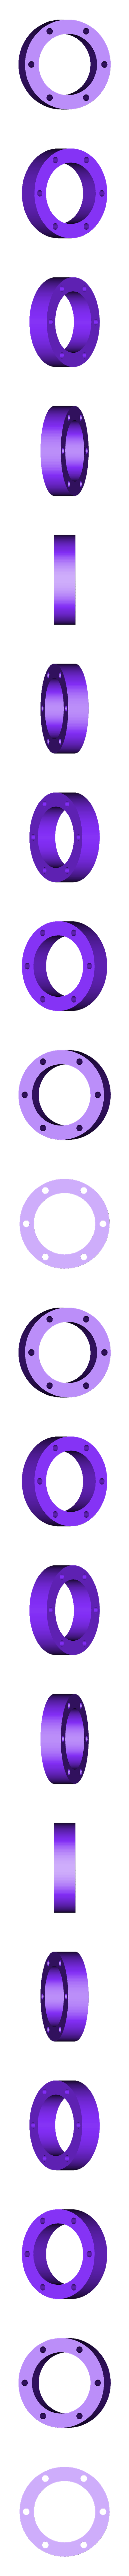 moyeu_quickrelease.stl Download free STL file Quickrelease adapter DIY Simracing OSW • 3D print object, Aliasze13